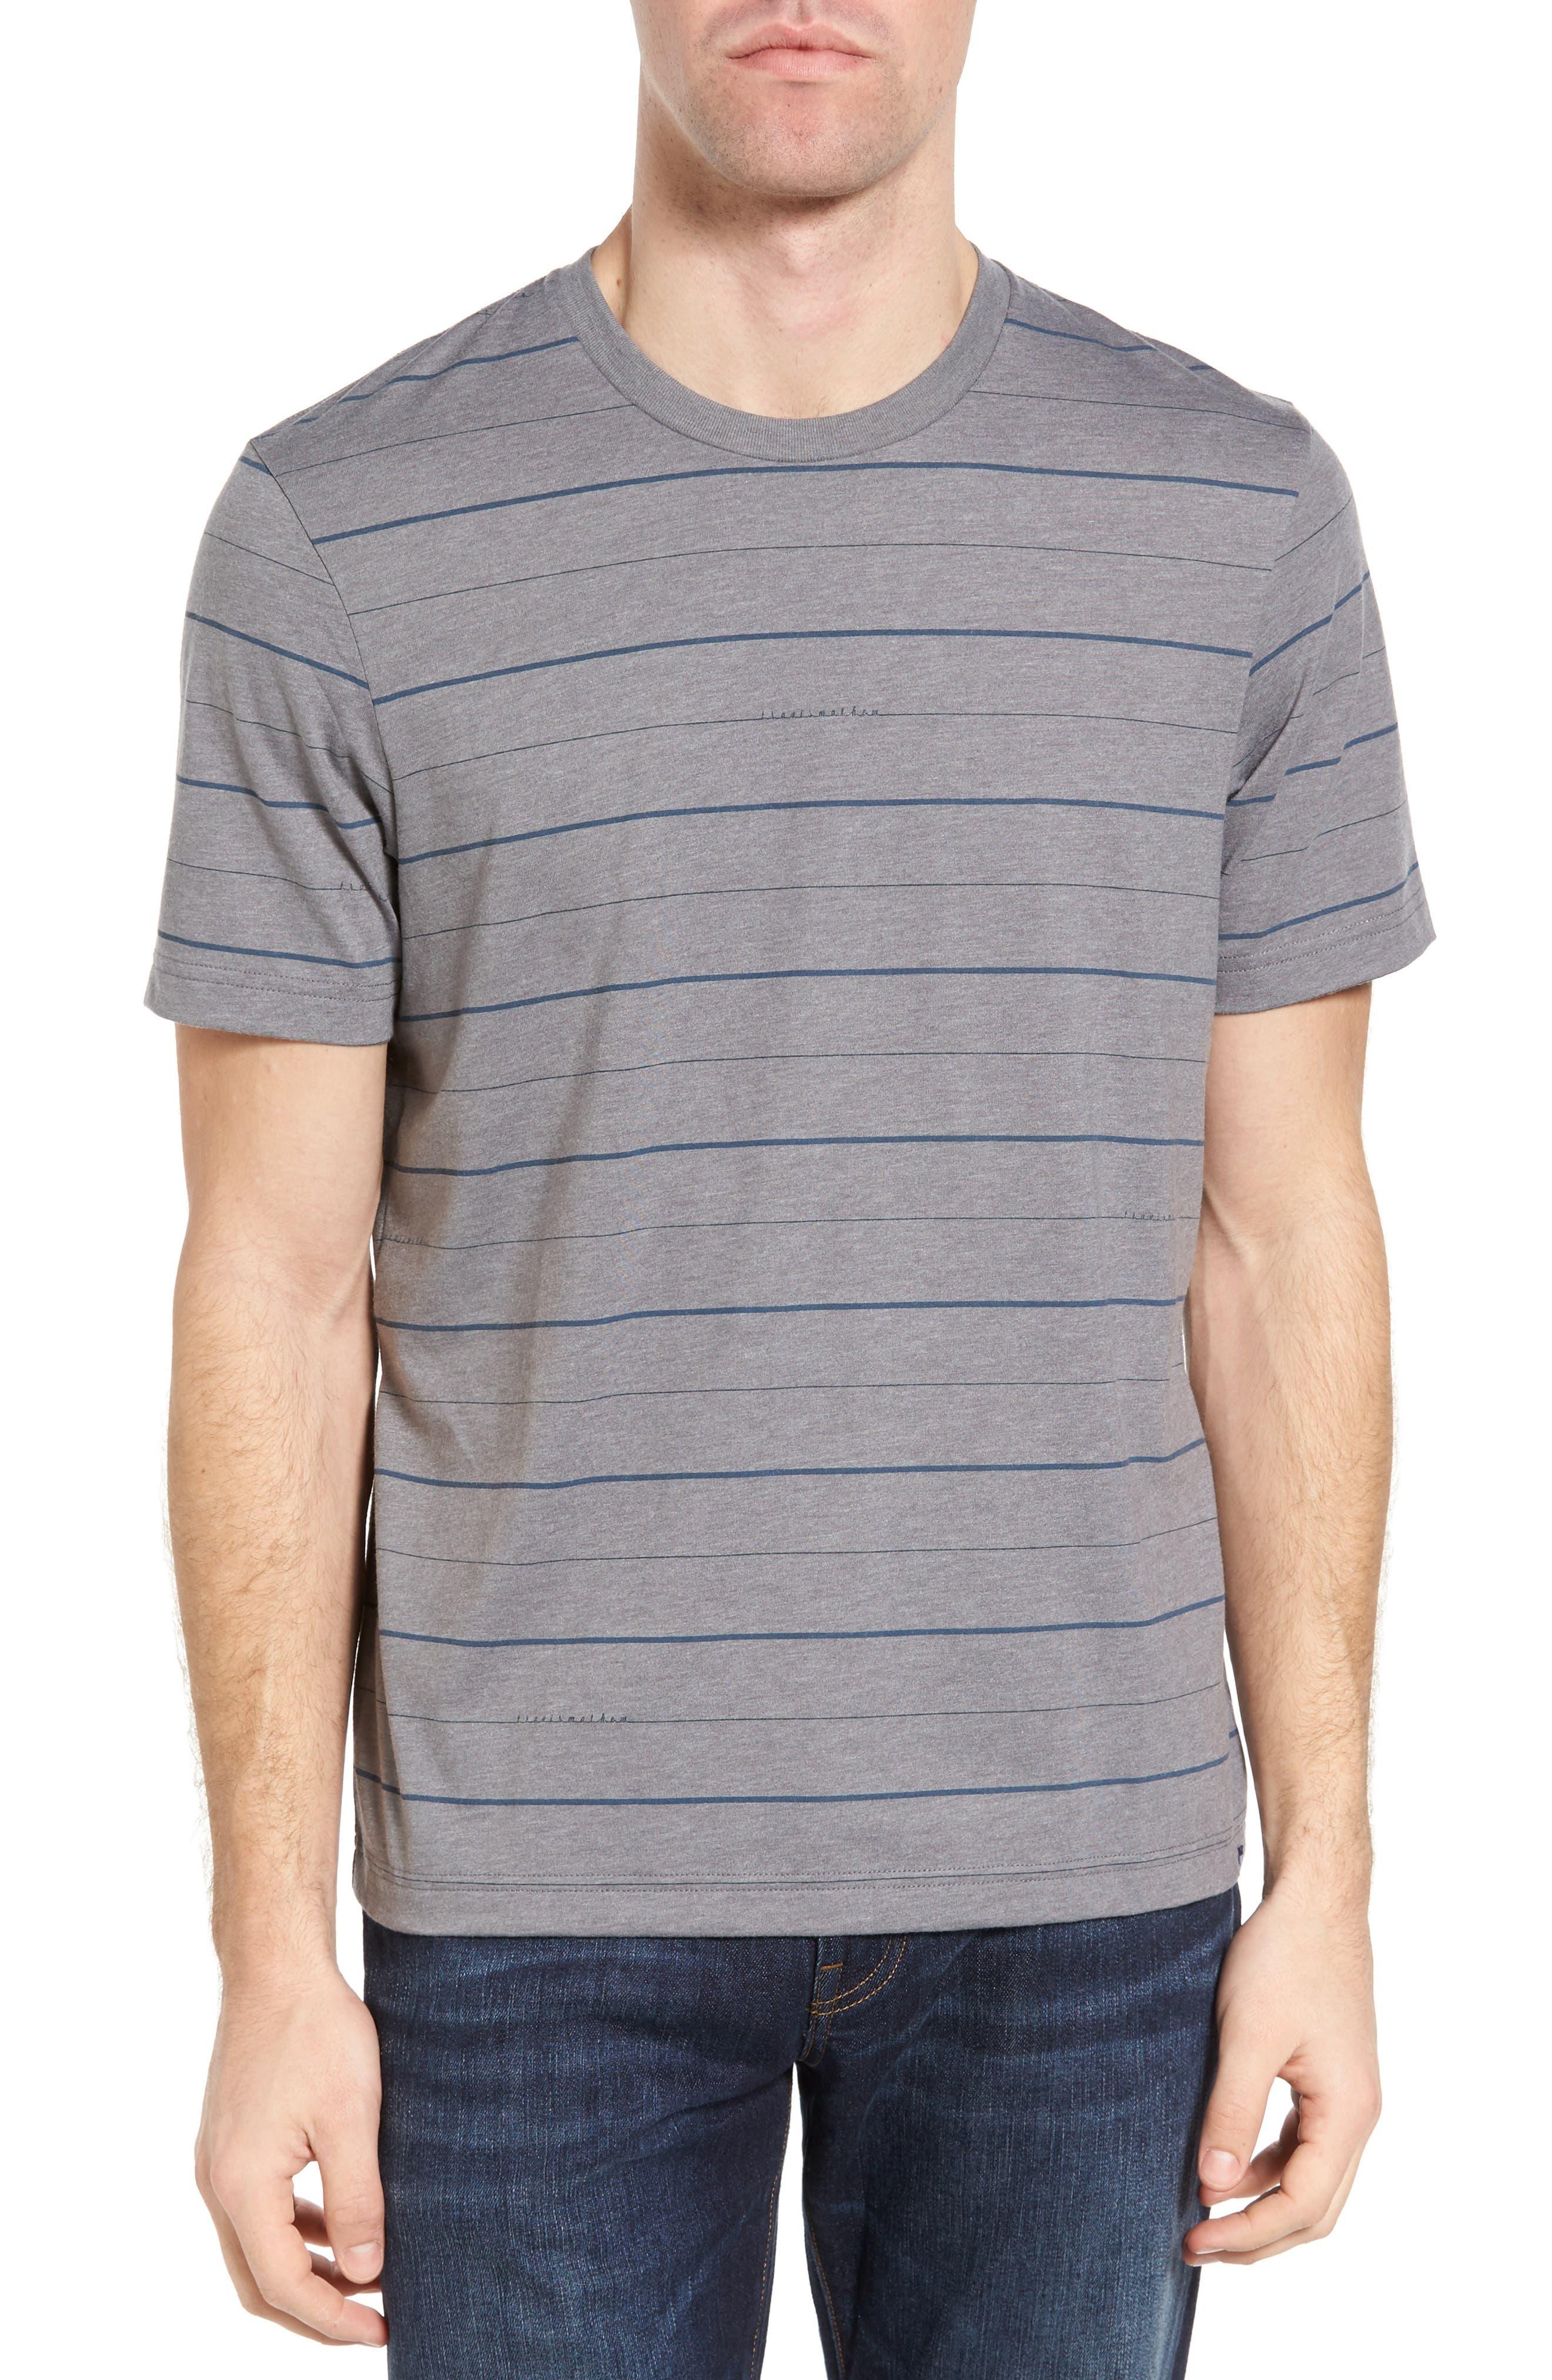 Hodapp T-Shirt,                         Main,                         color, 020